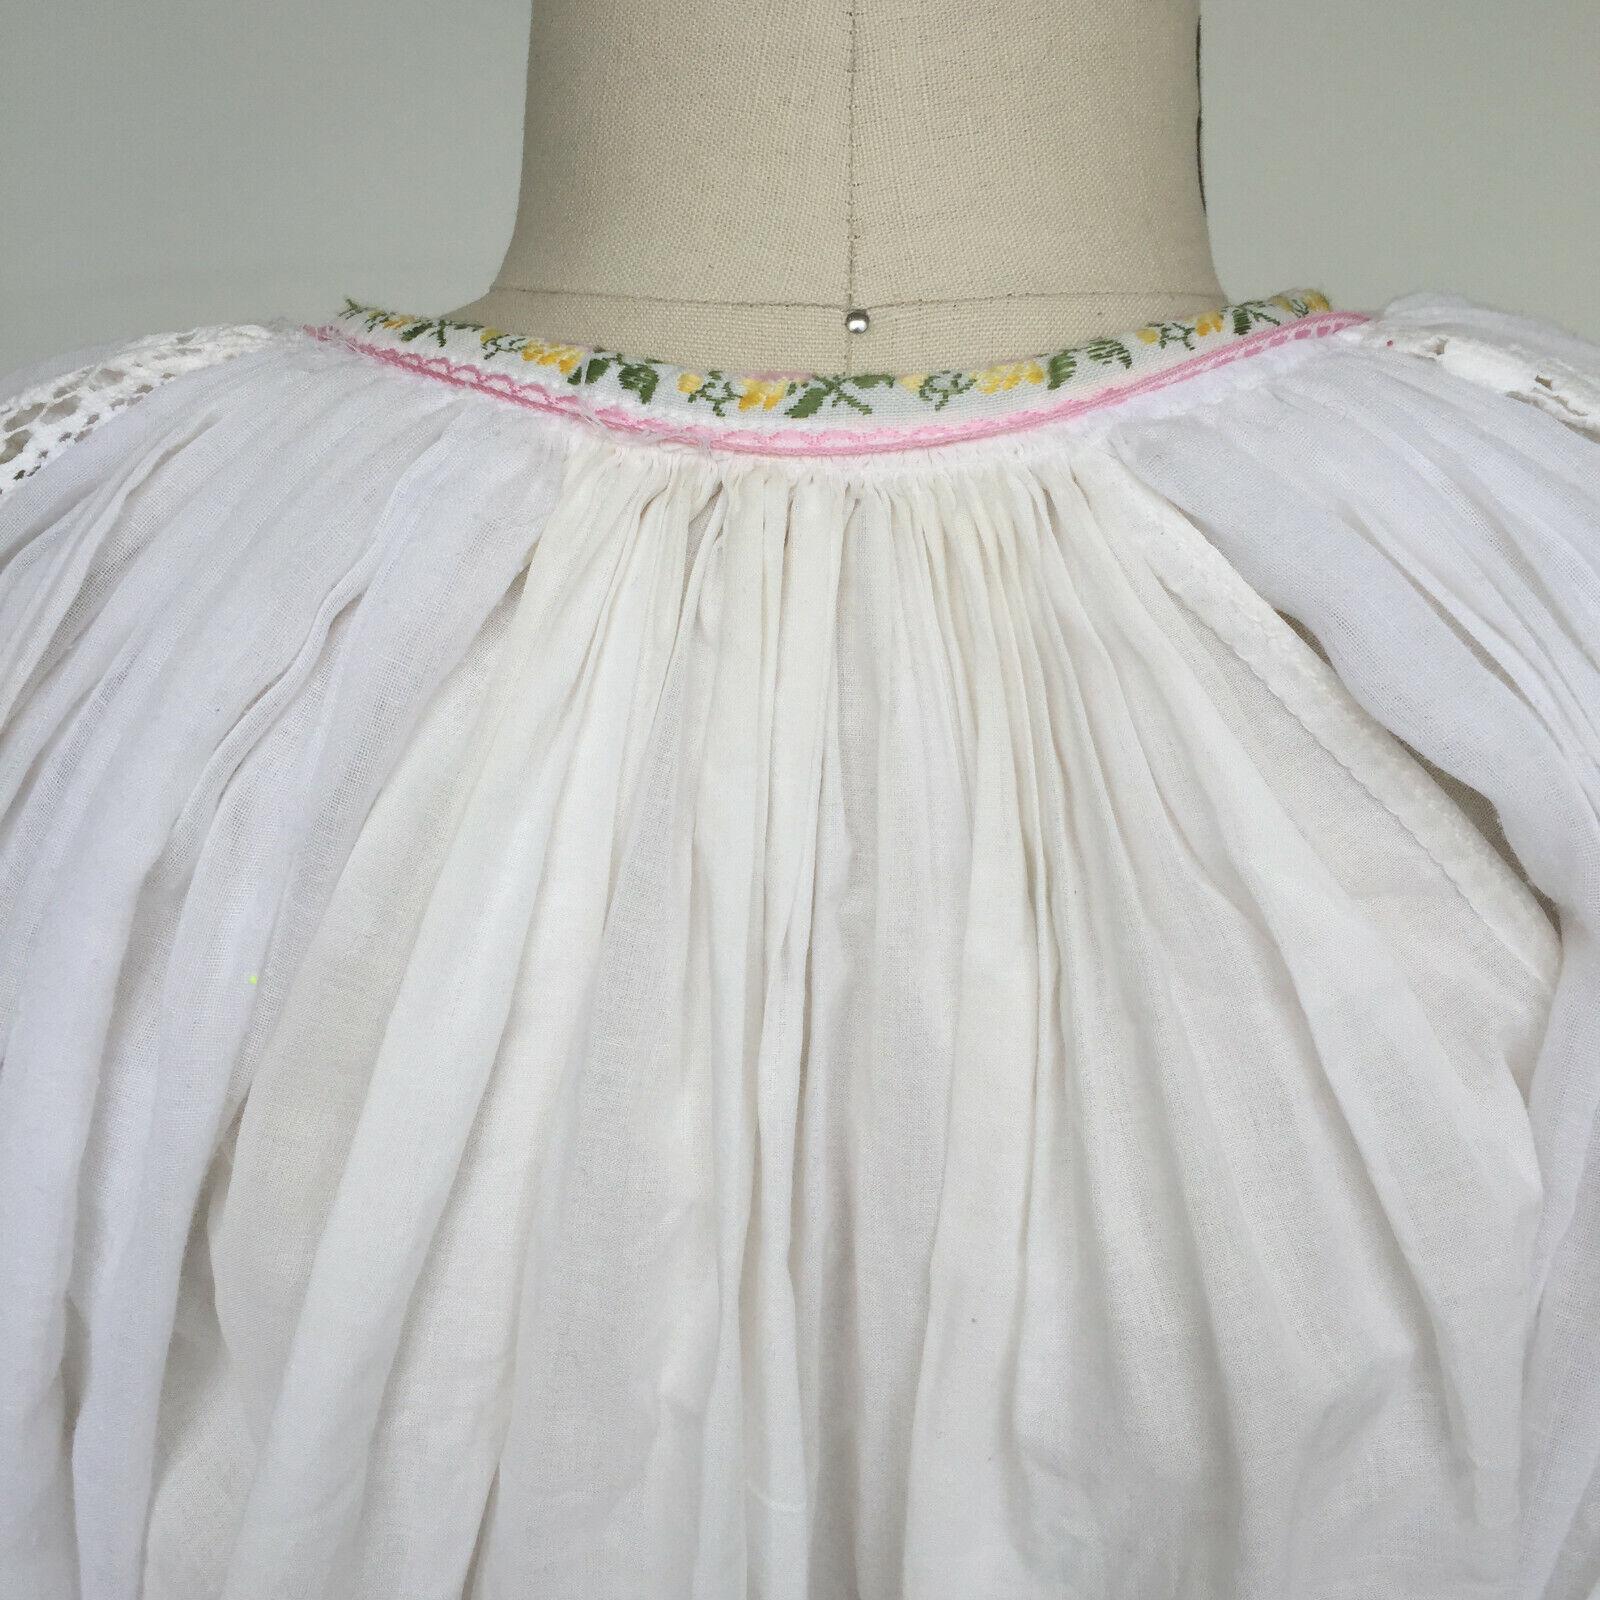 VTG 1970s Hungarian Handmade Textured Boho-Chic P… - image 2